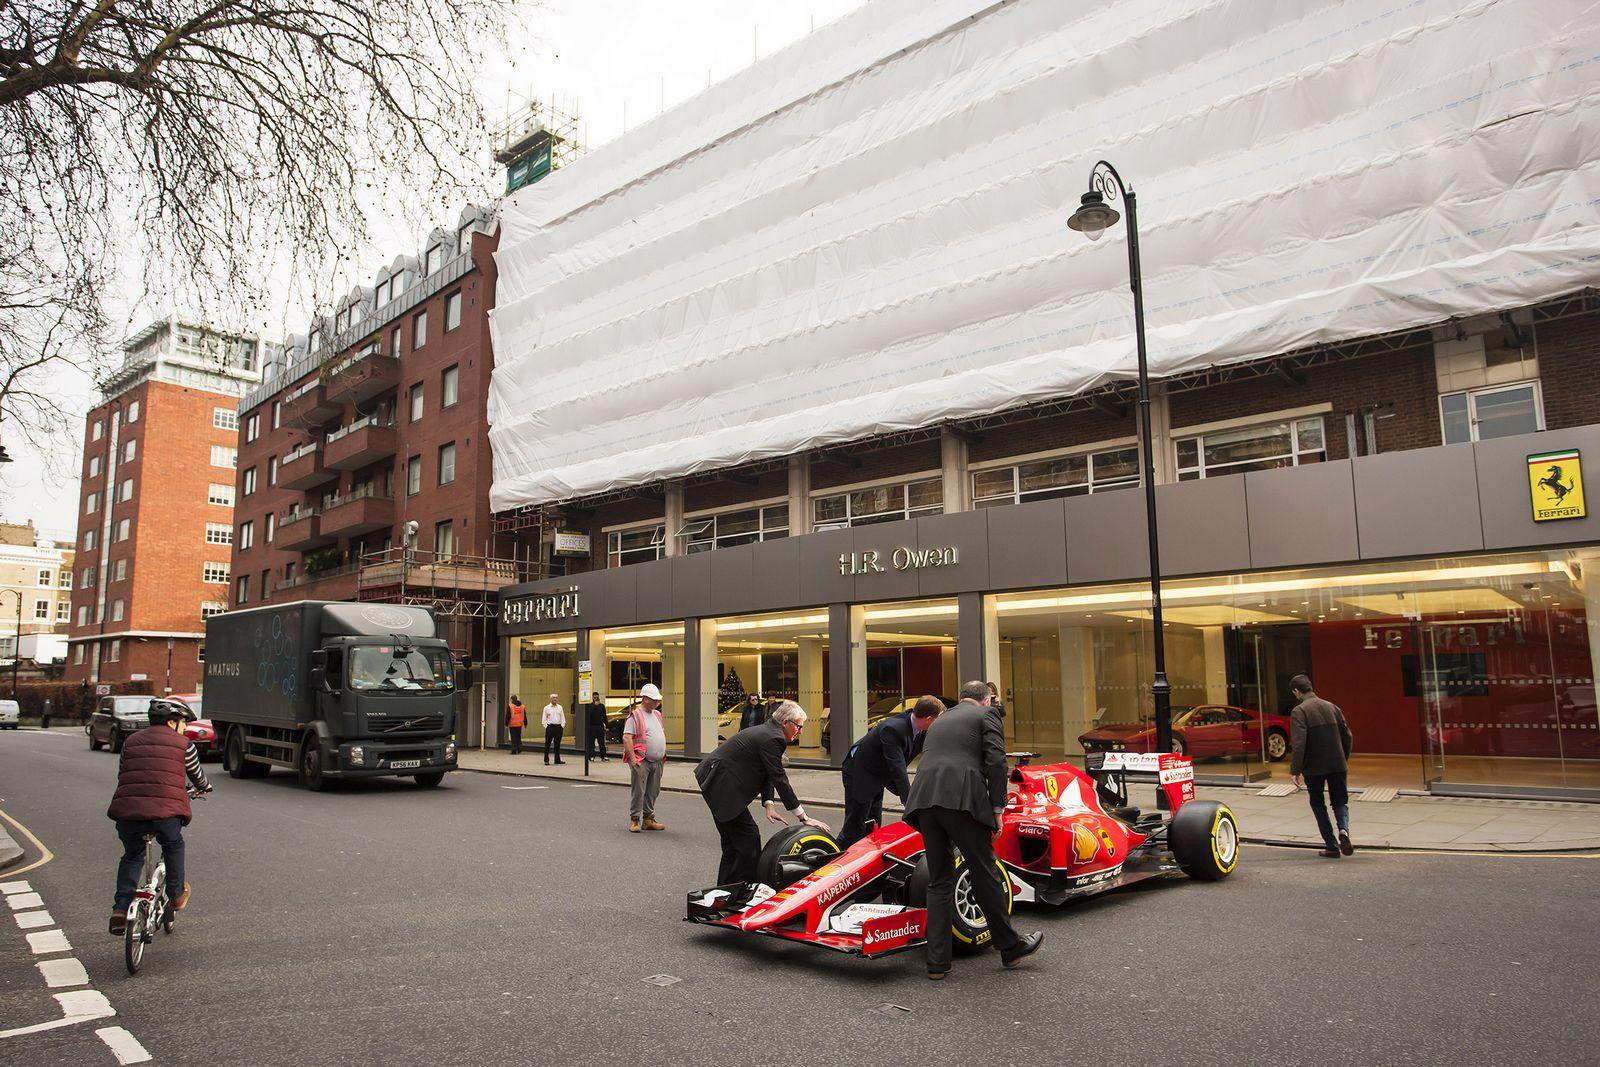 Hennessey Venom F5 >> Ferrari Dealership Named World's Best, Gets 2015 F1 Car | Carscoops